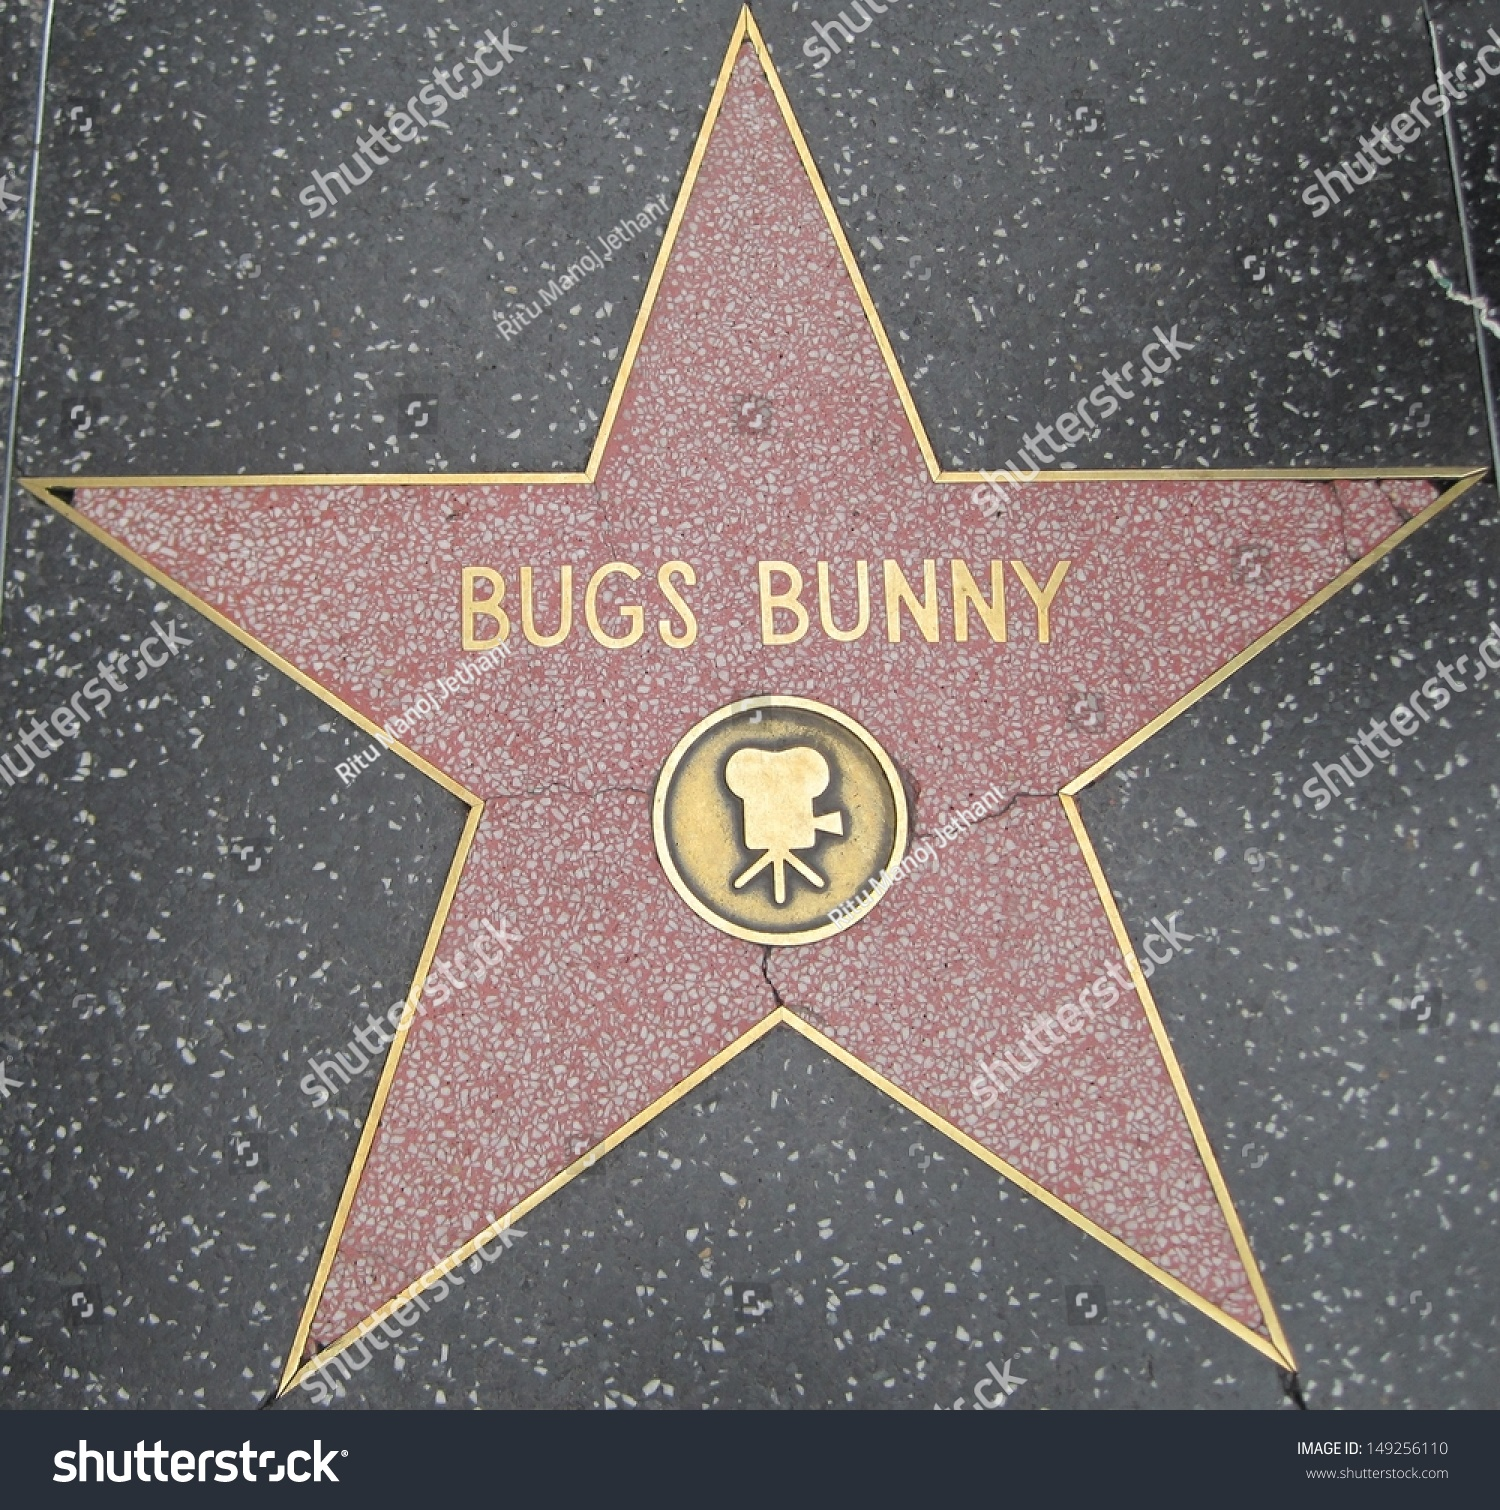 Stardom hollywood dating bug